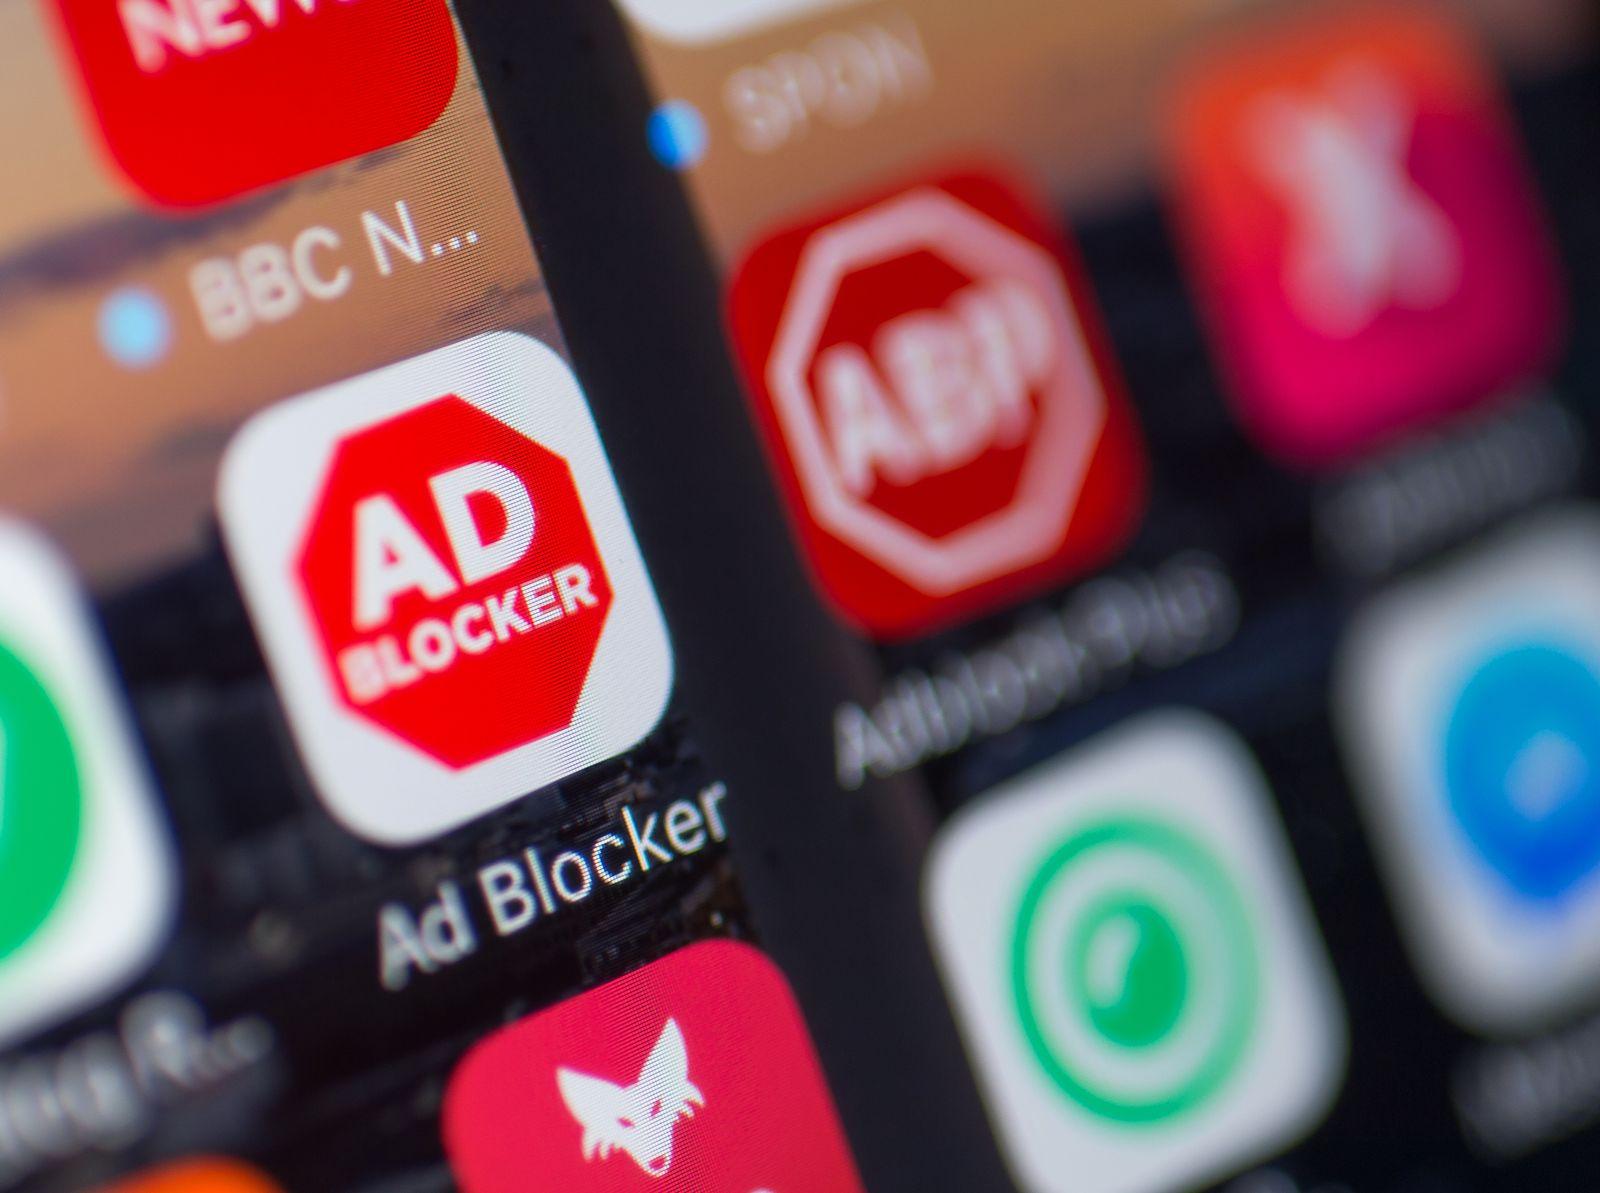 Werbeblocker AdBlock/ Adblocker